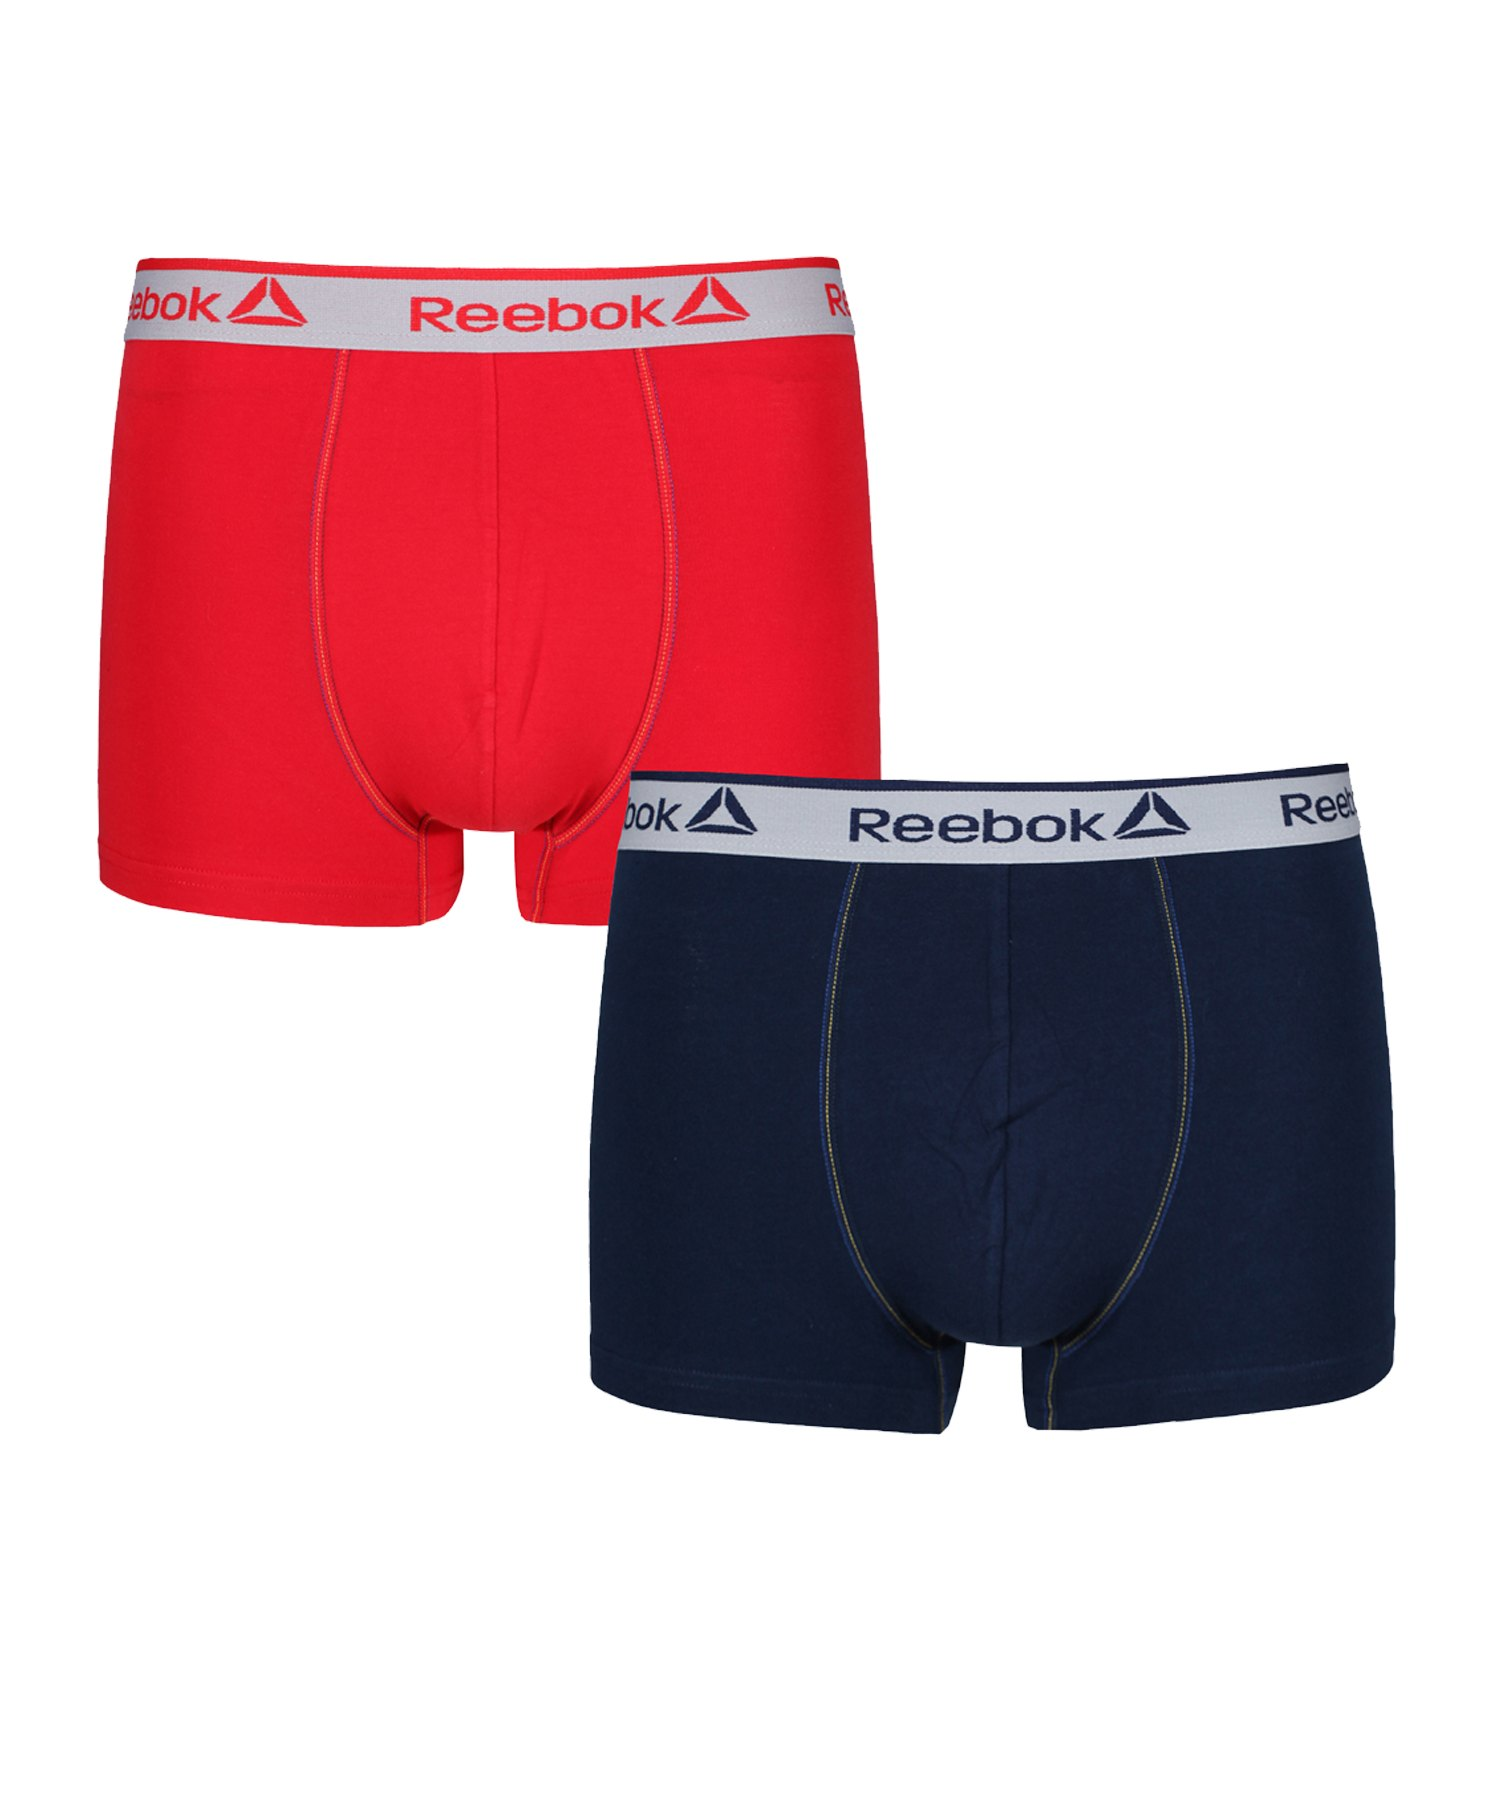 Reebok 2er Pack Trunk BILLY BoxershortBlau und Rot - blau